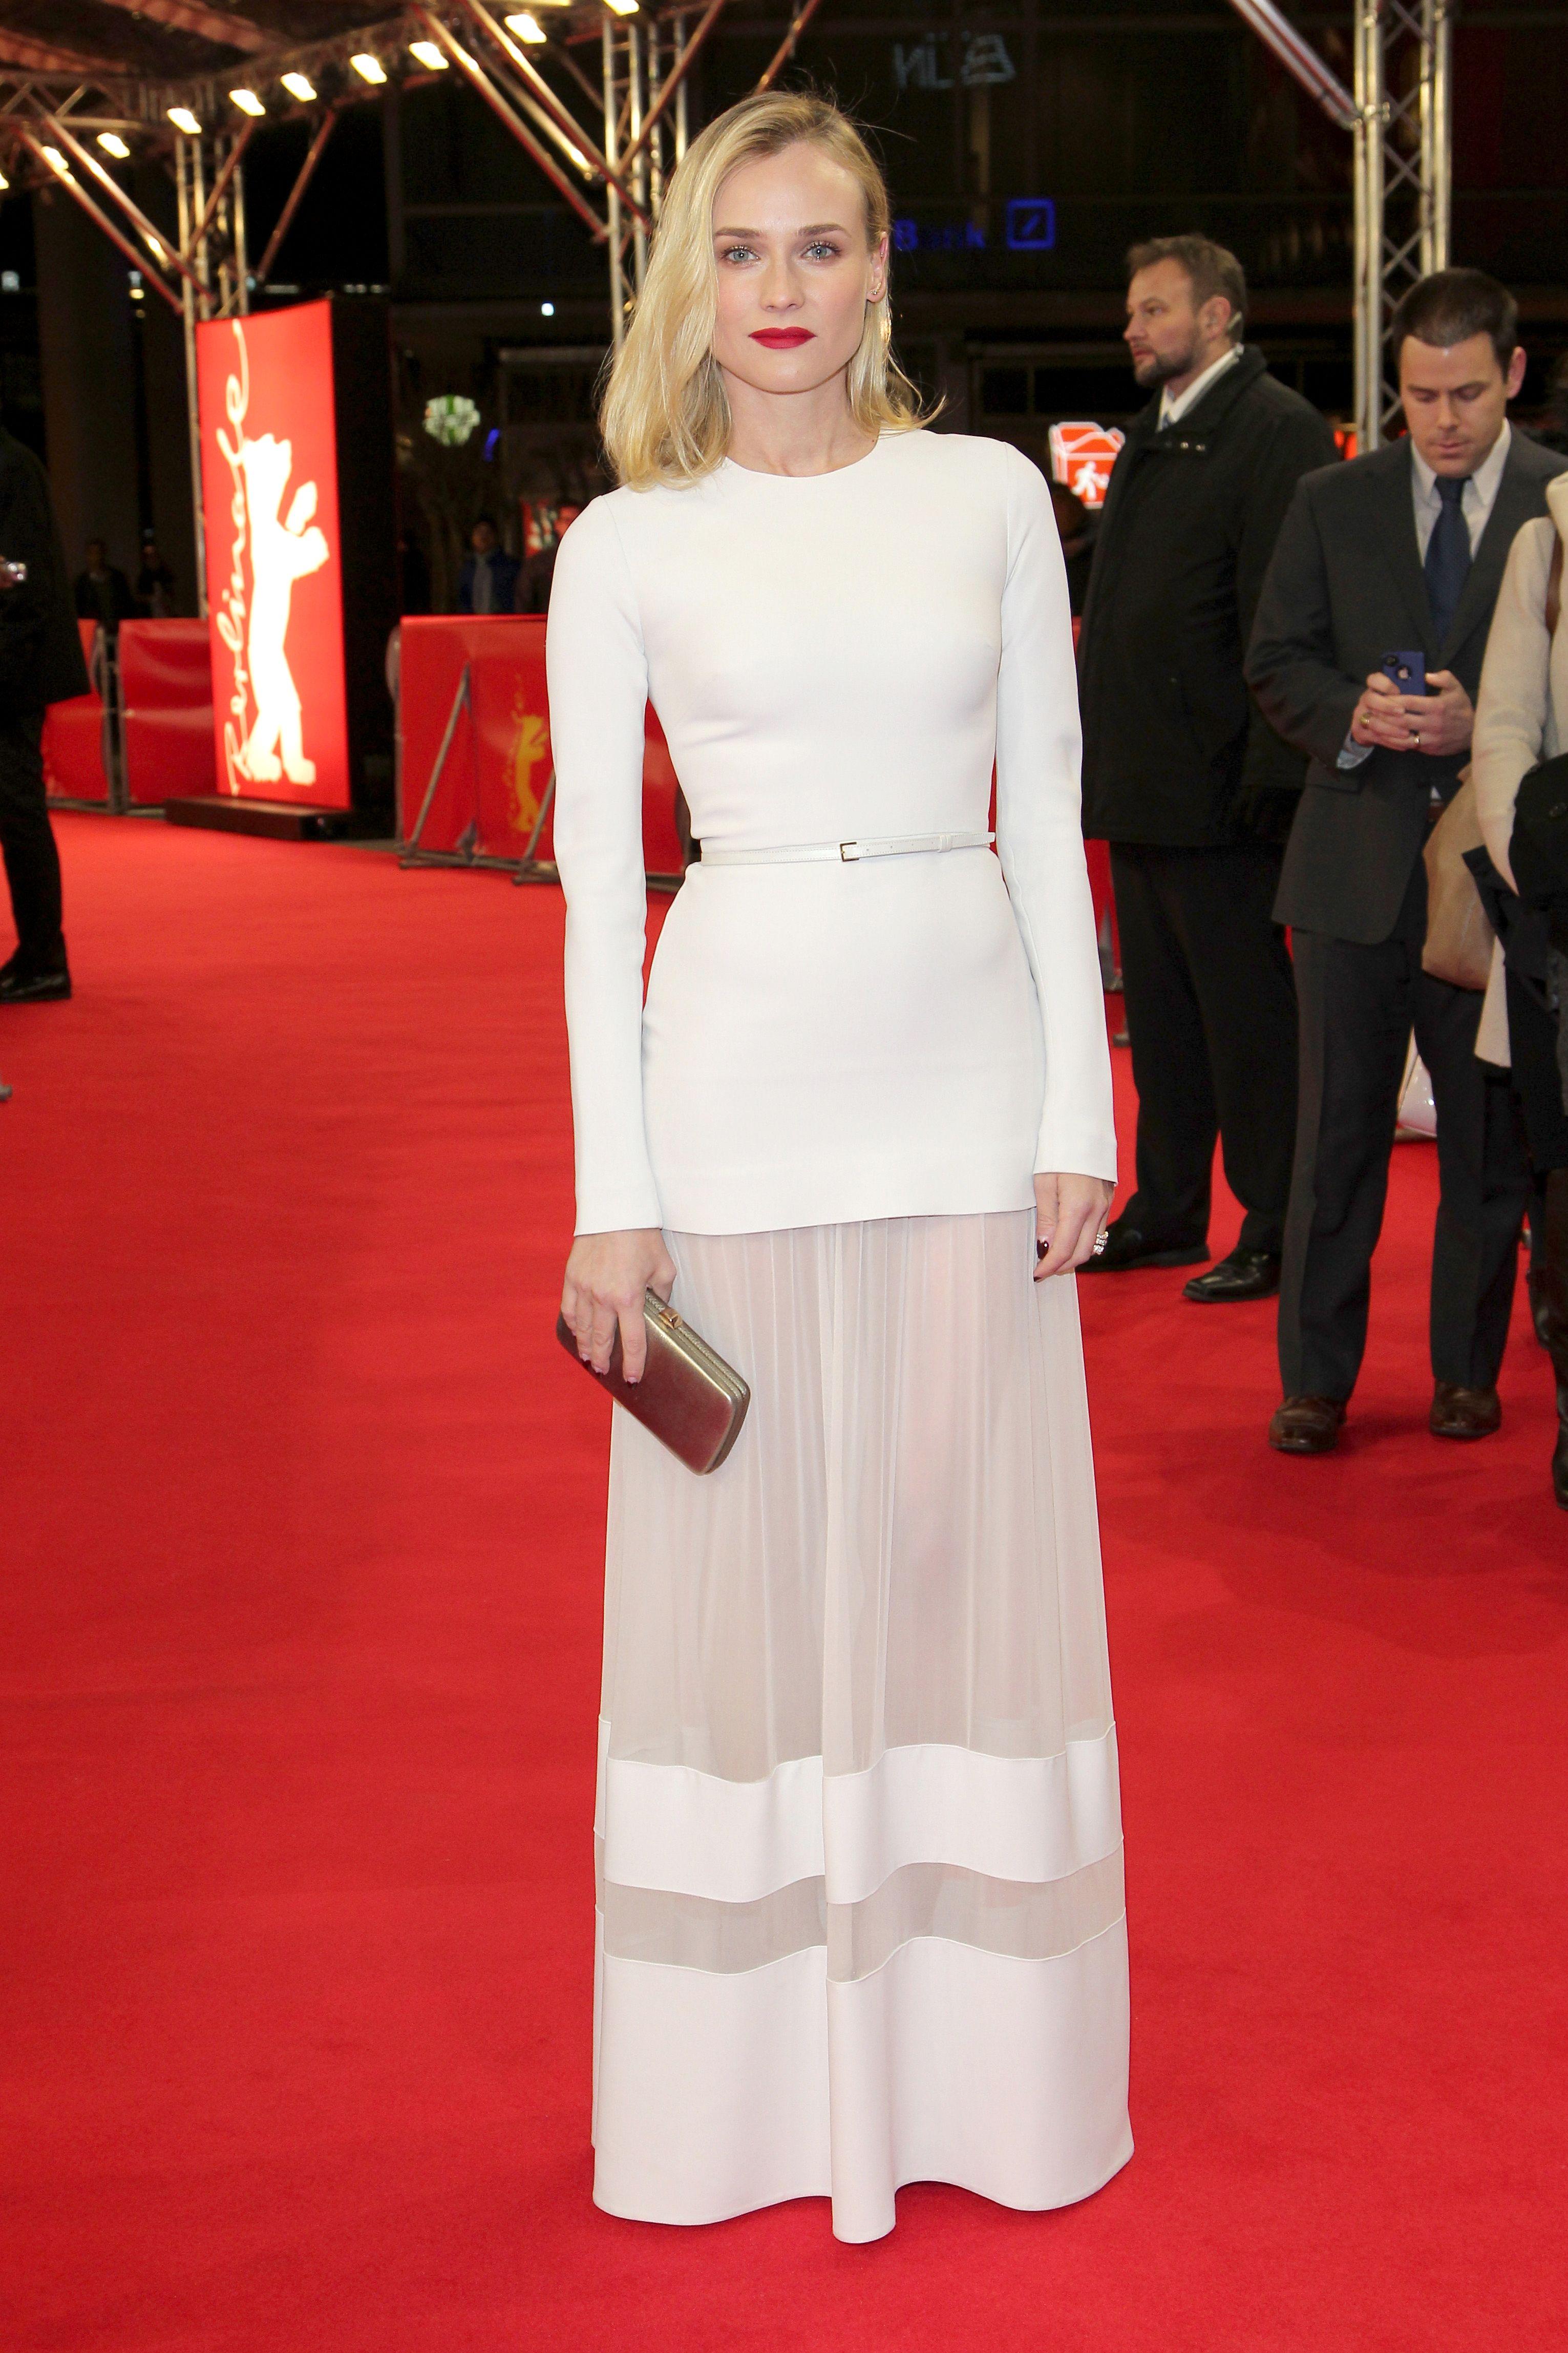 Lookvogue lady in whiteu diane kruger hipnotiza la alfombra roja en